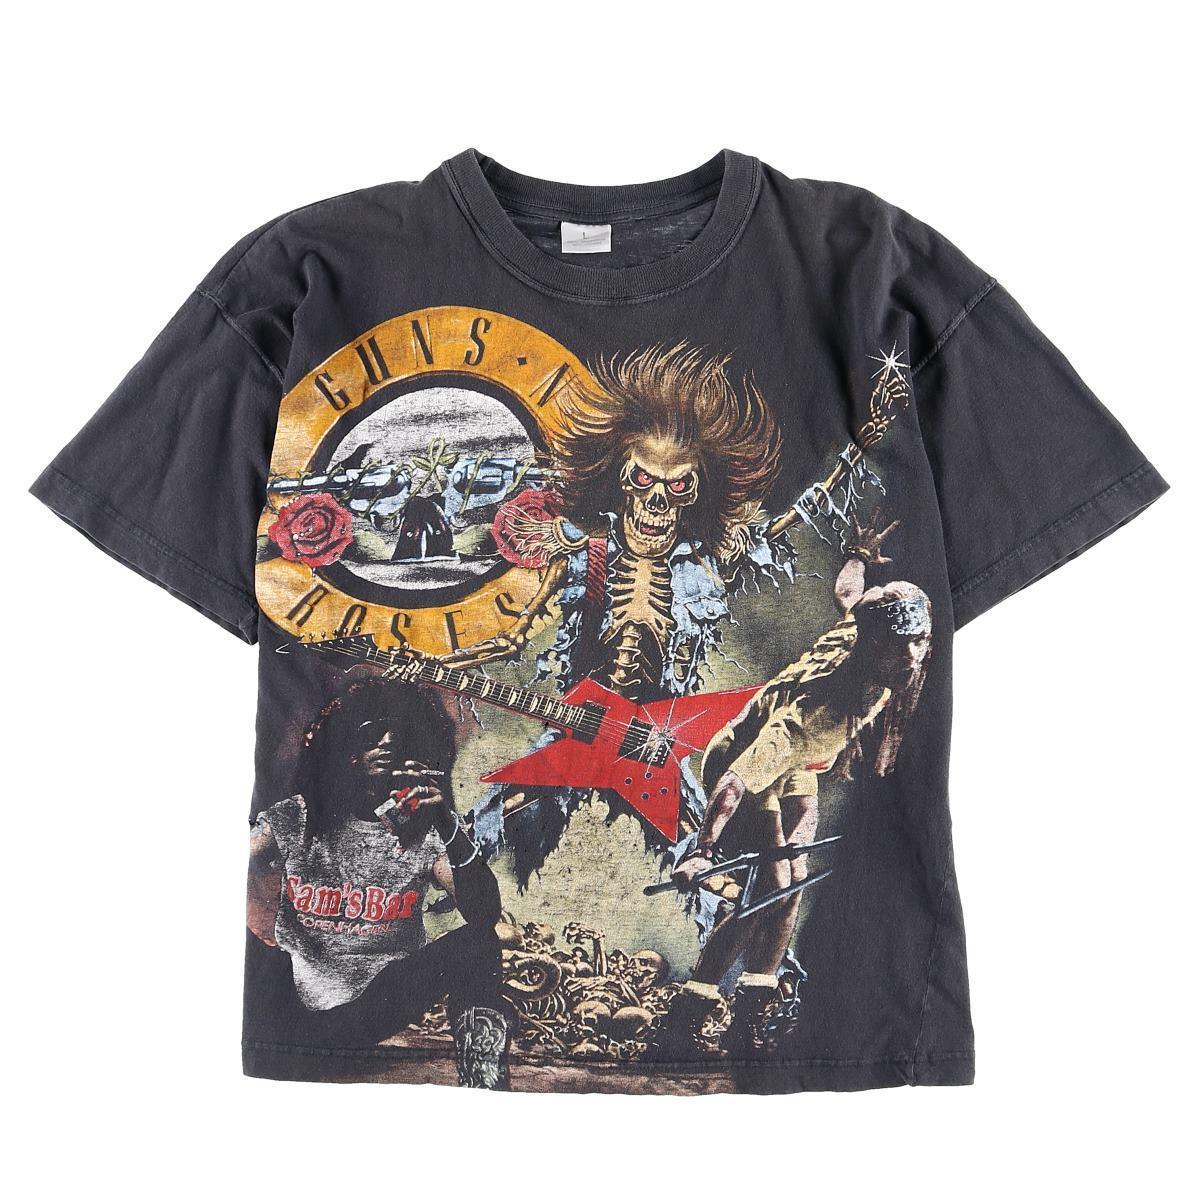 Metallica Wherever I May Roam 2012 European Tour Tshirt XL T-shirt